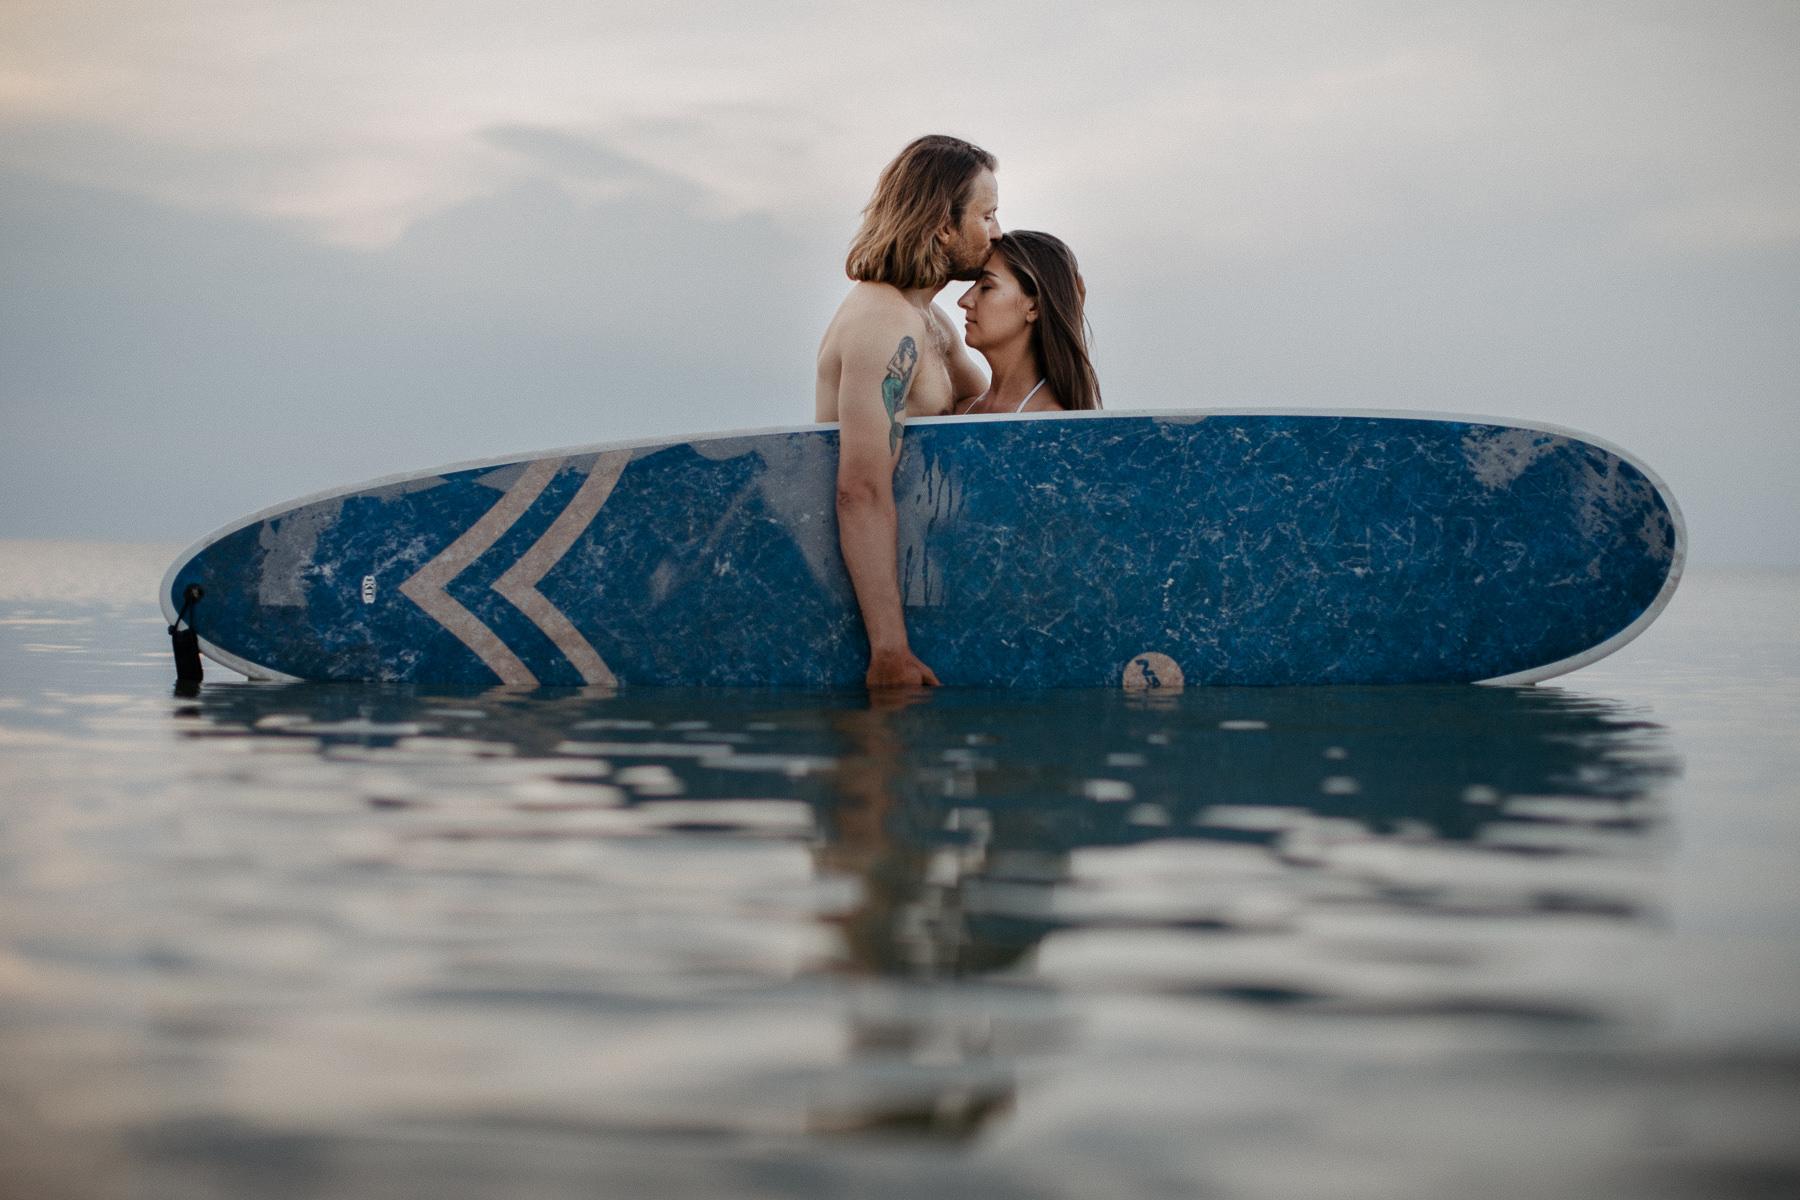 surfing nad morzem w polsce